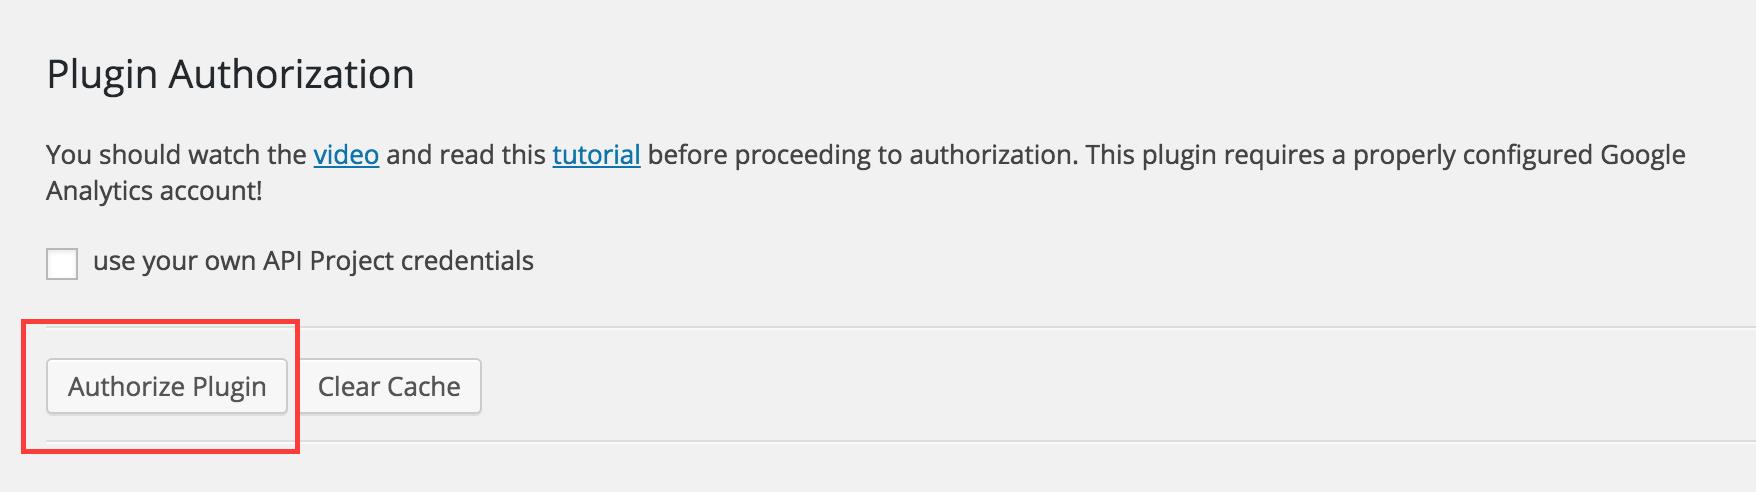 4-GoogleAnalyticsAuthorization